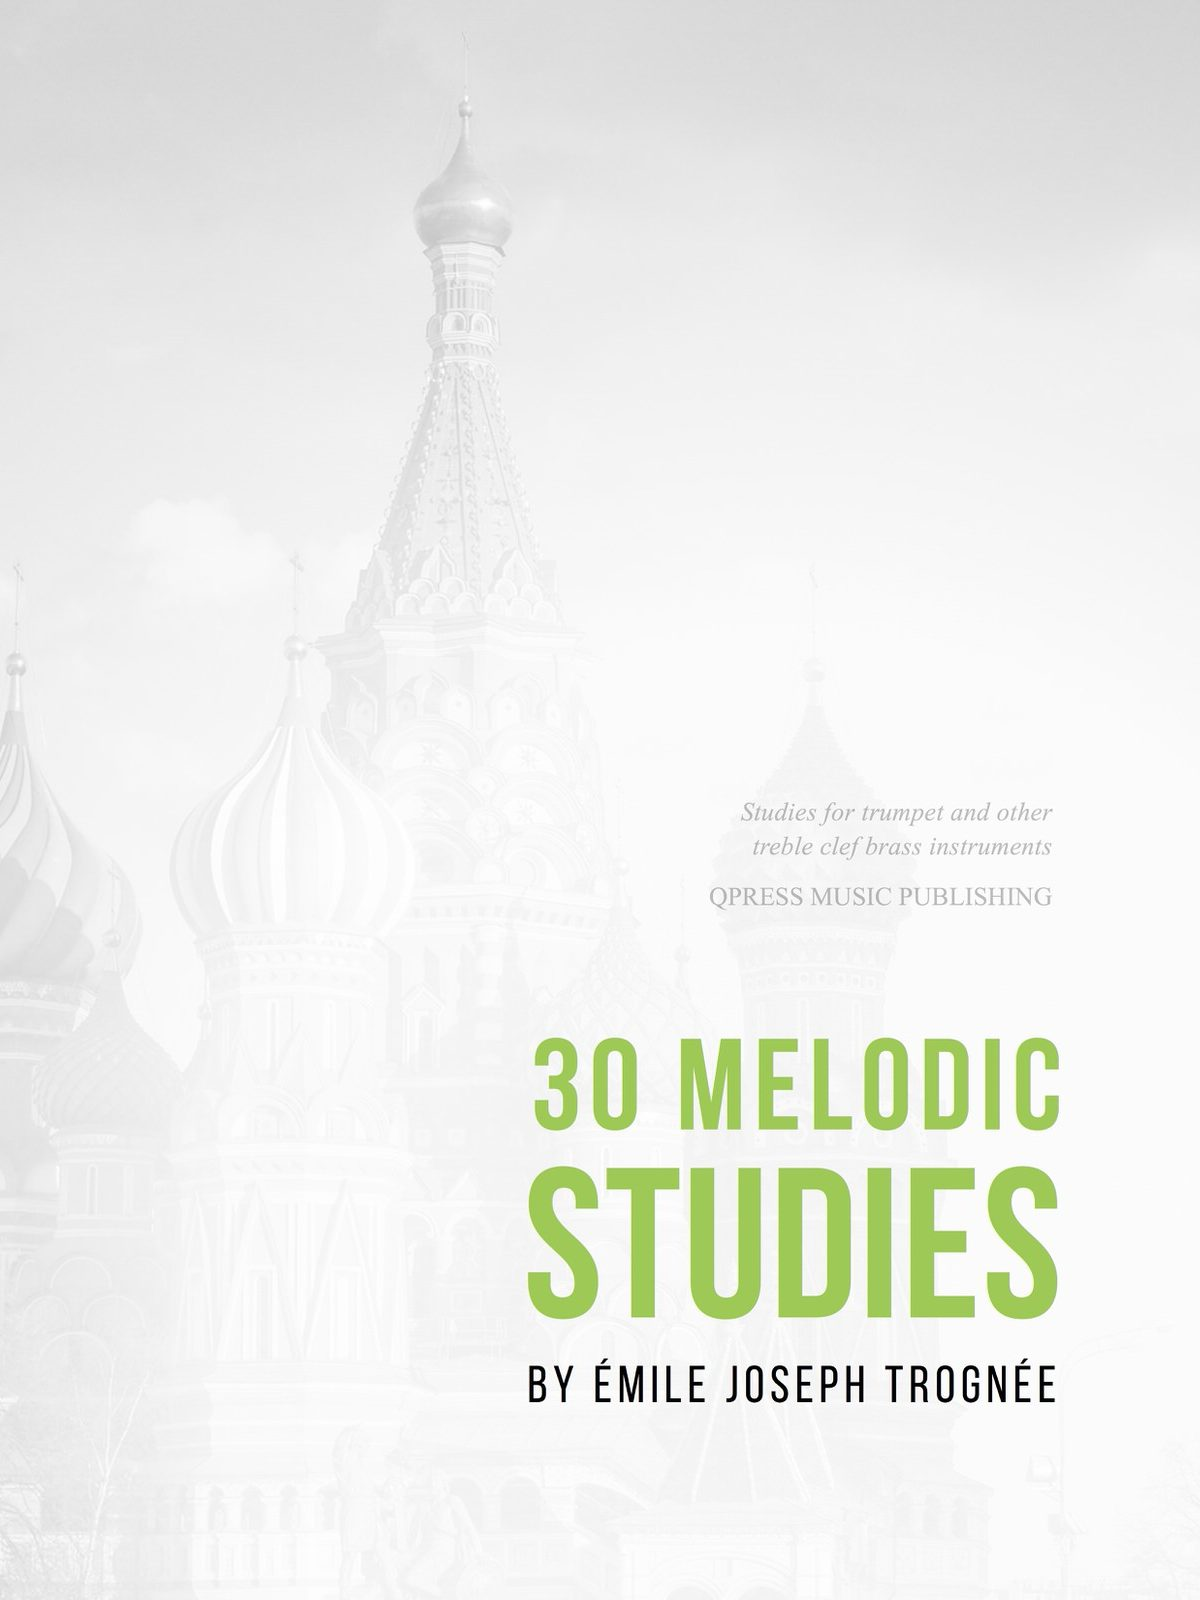 Trognee, 30 Melodic Studies-p01